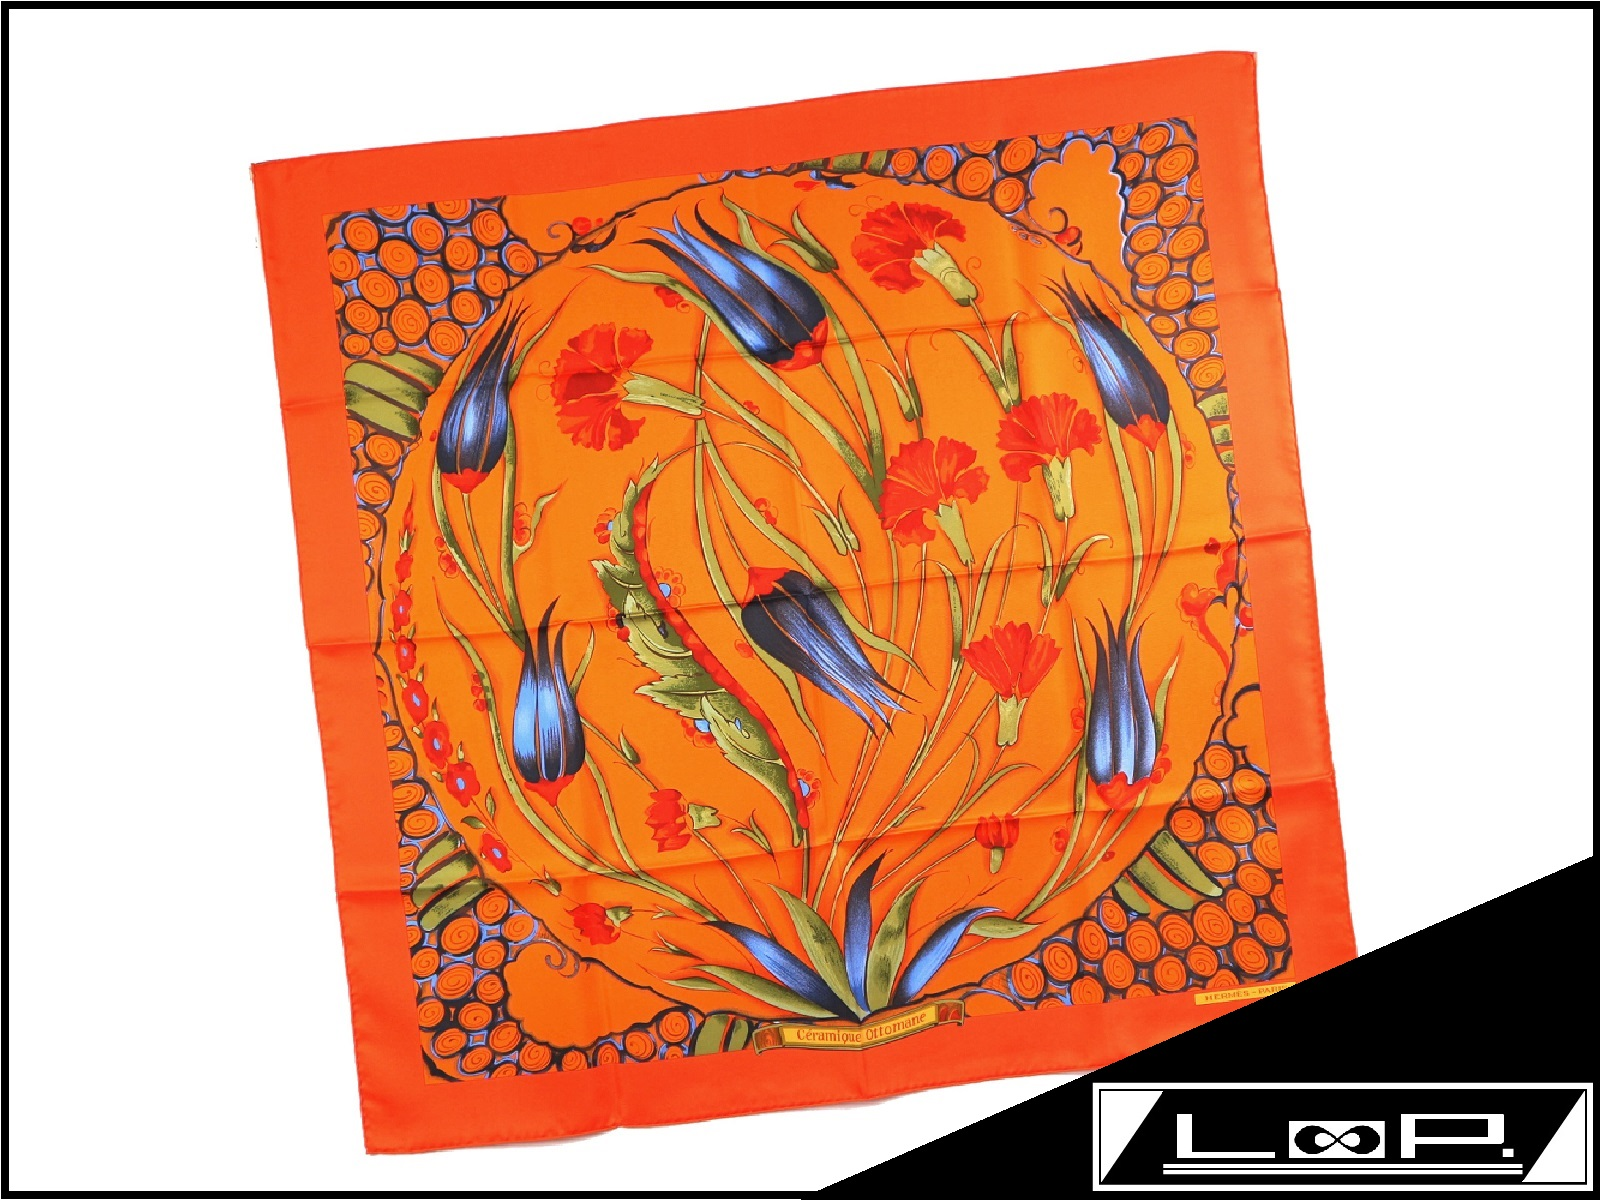 【SALE】【未使用】 エルメス カレ 90 スカーフ CERAMIQUE OTTOMANE オスマン陶磁器 花柄 シルク オレンジ 【A17109】 【中古】